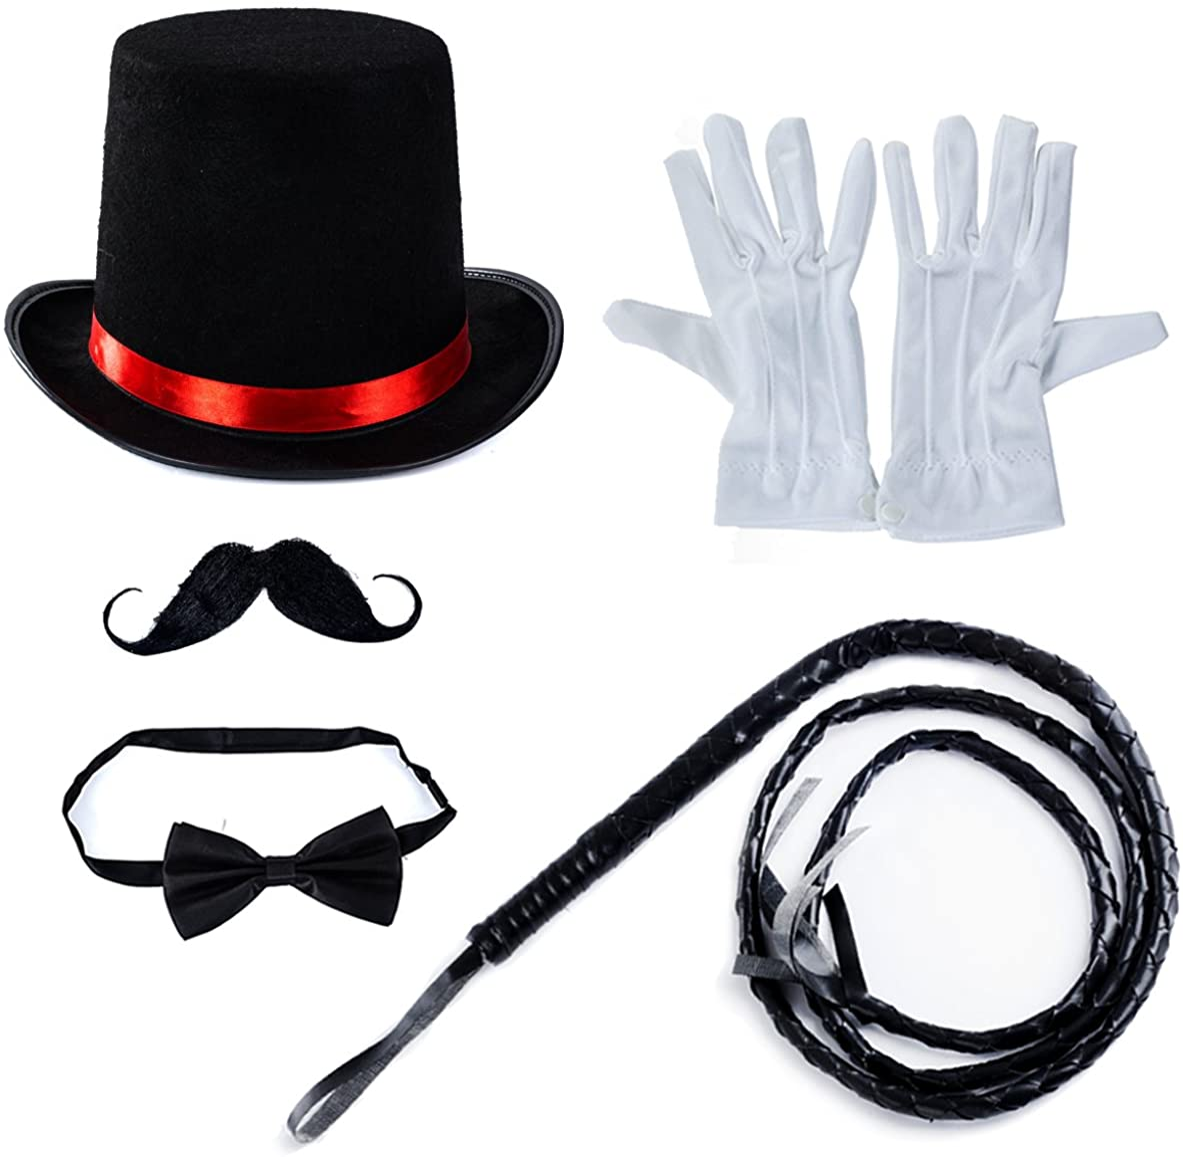 SILVER SEQUIN TOP HAT DANCE CANE BOW TIE FANCY DRESS RINGMASTER CABARET SHOW